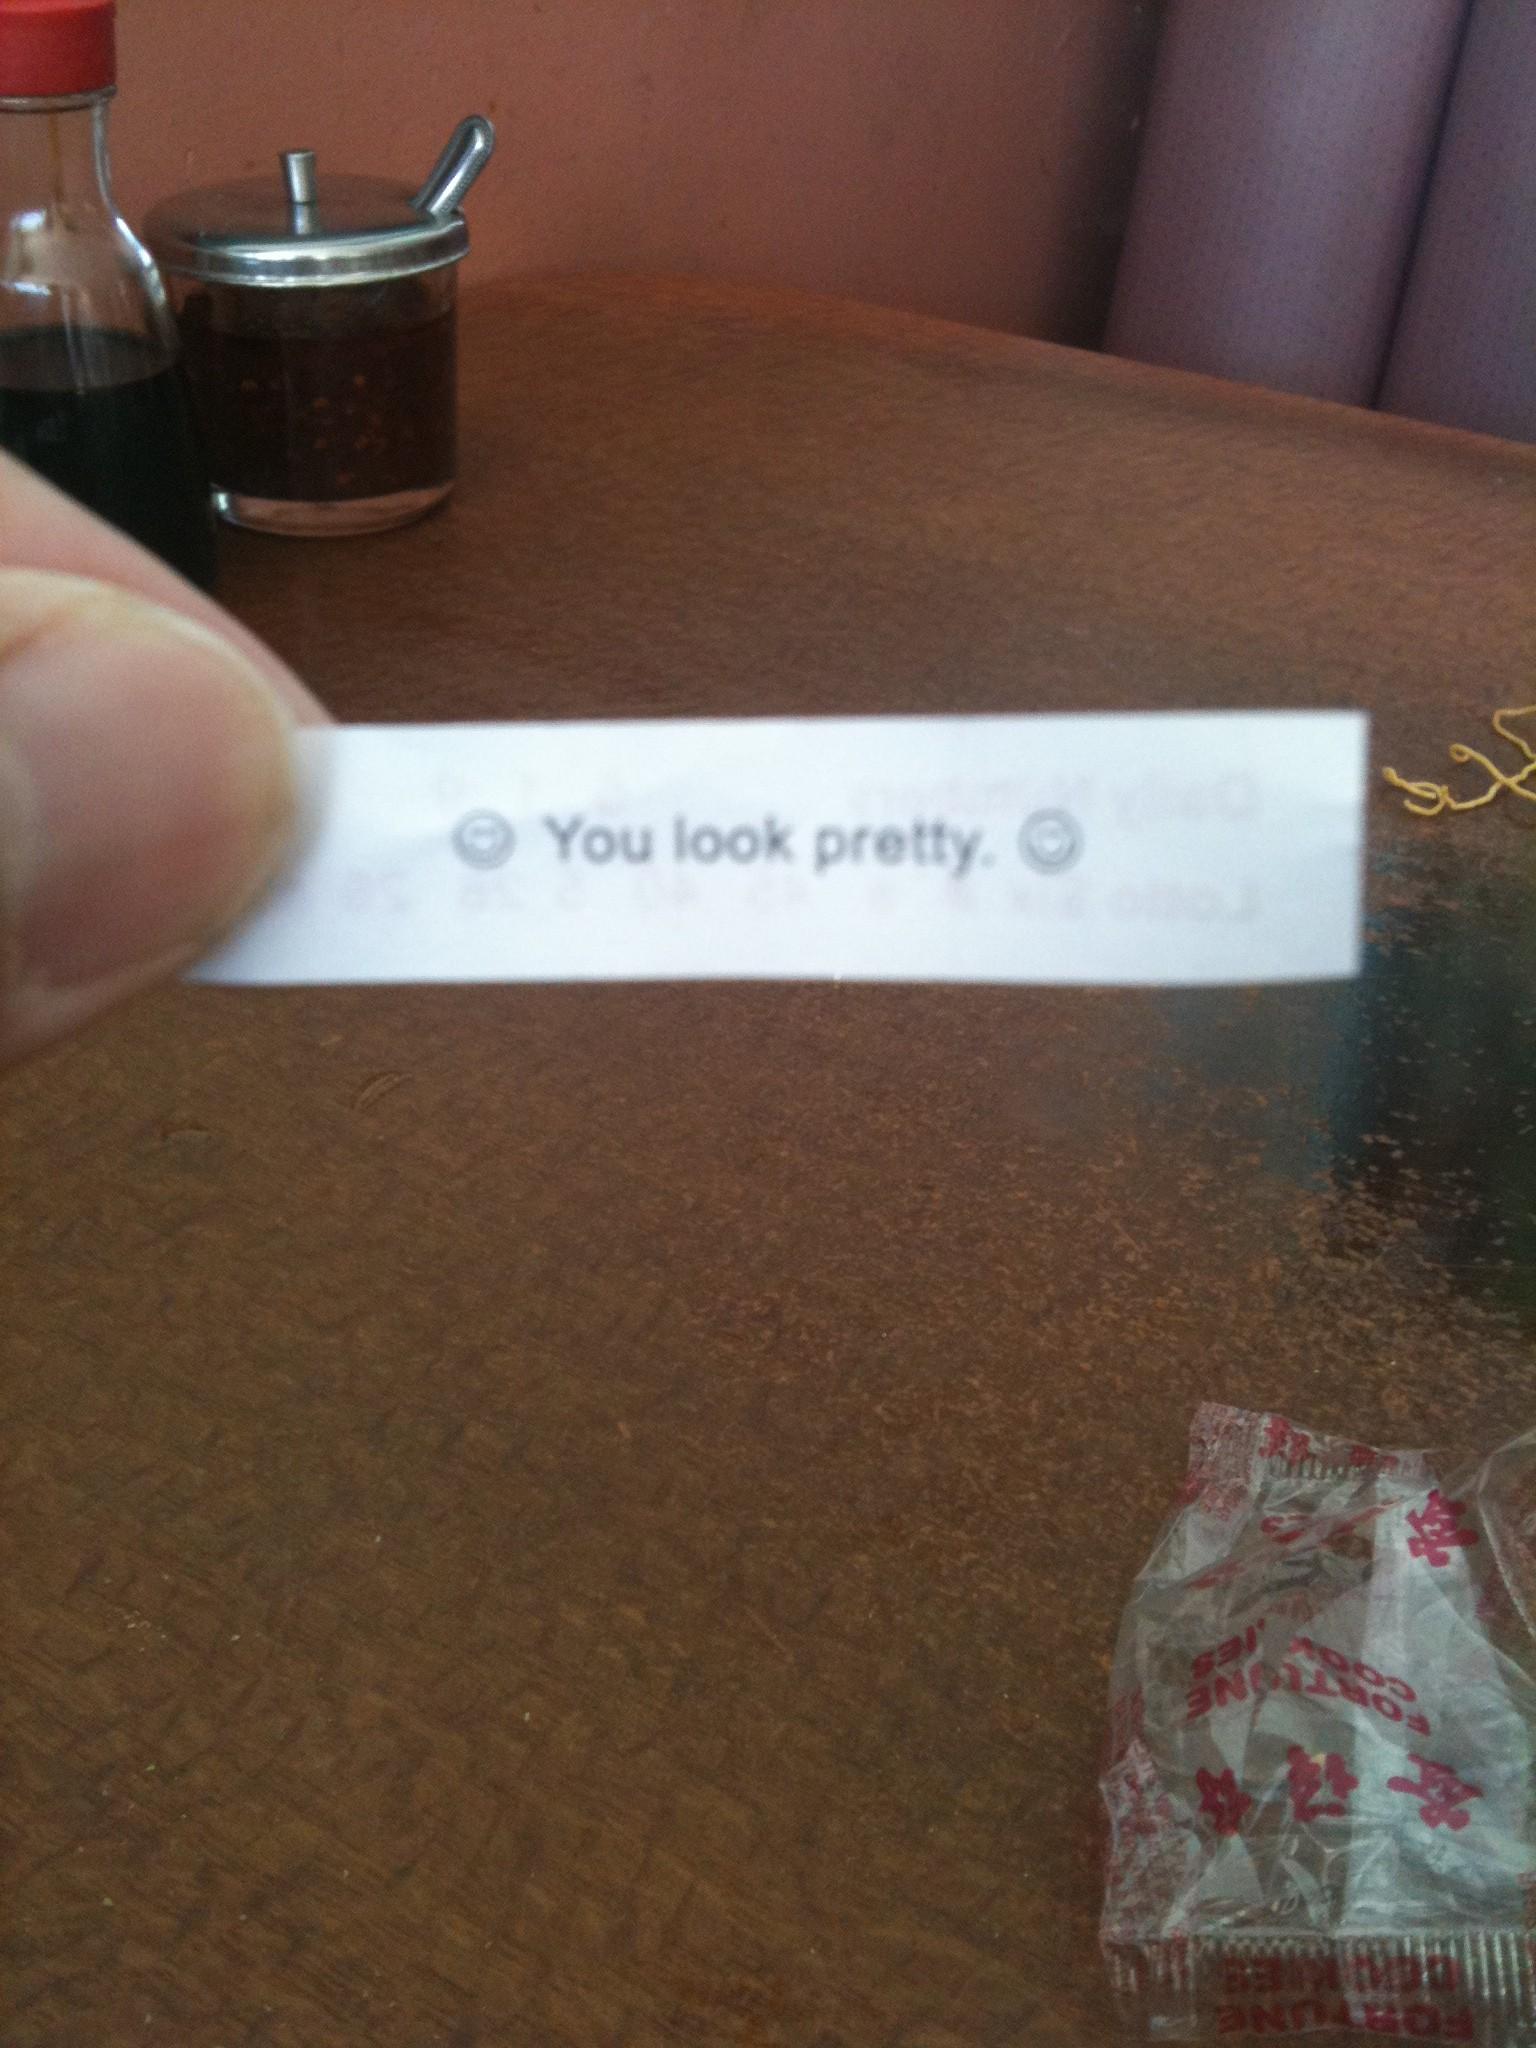 You Look Pretty!